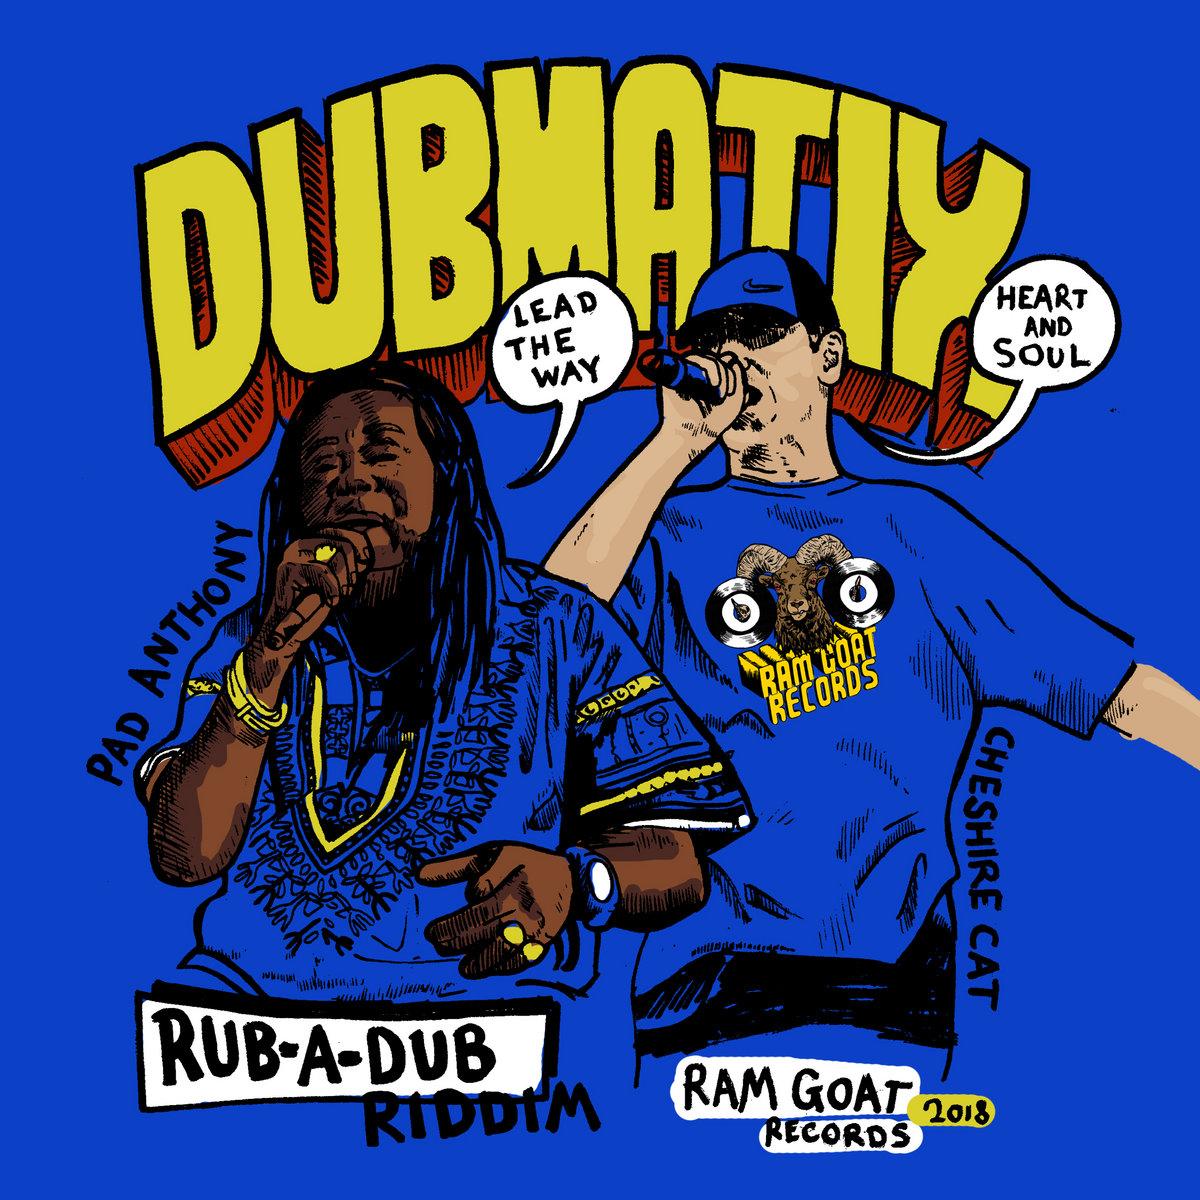 RUB-A-DUB RIDDIM | Ram Goat Records